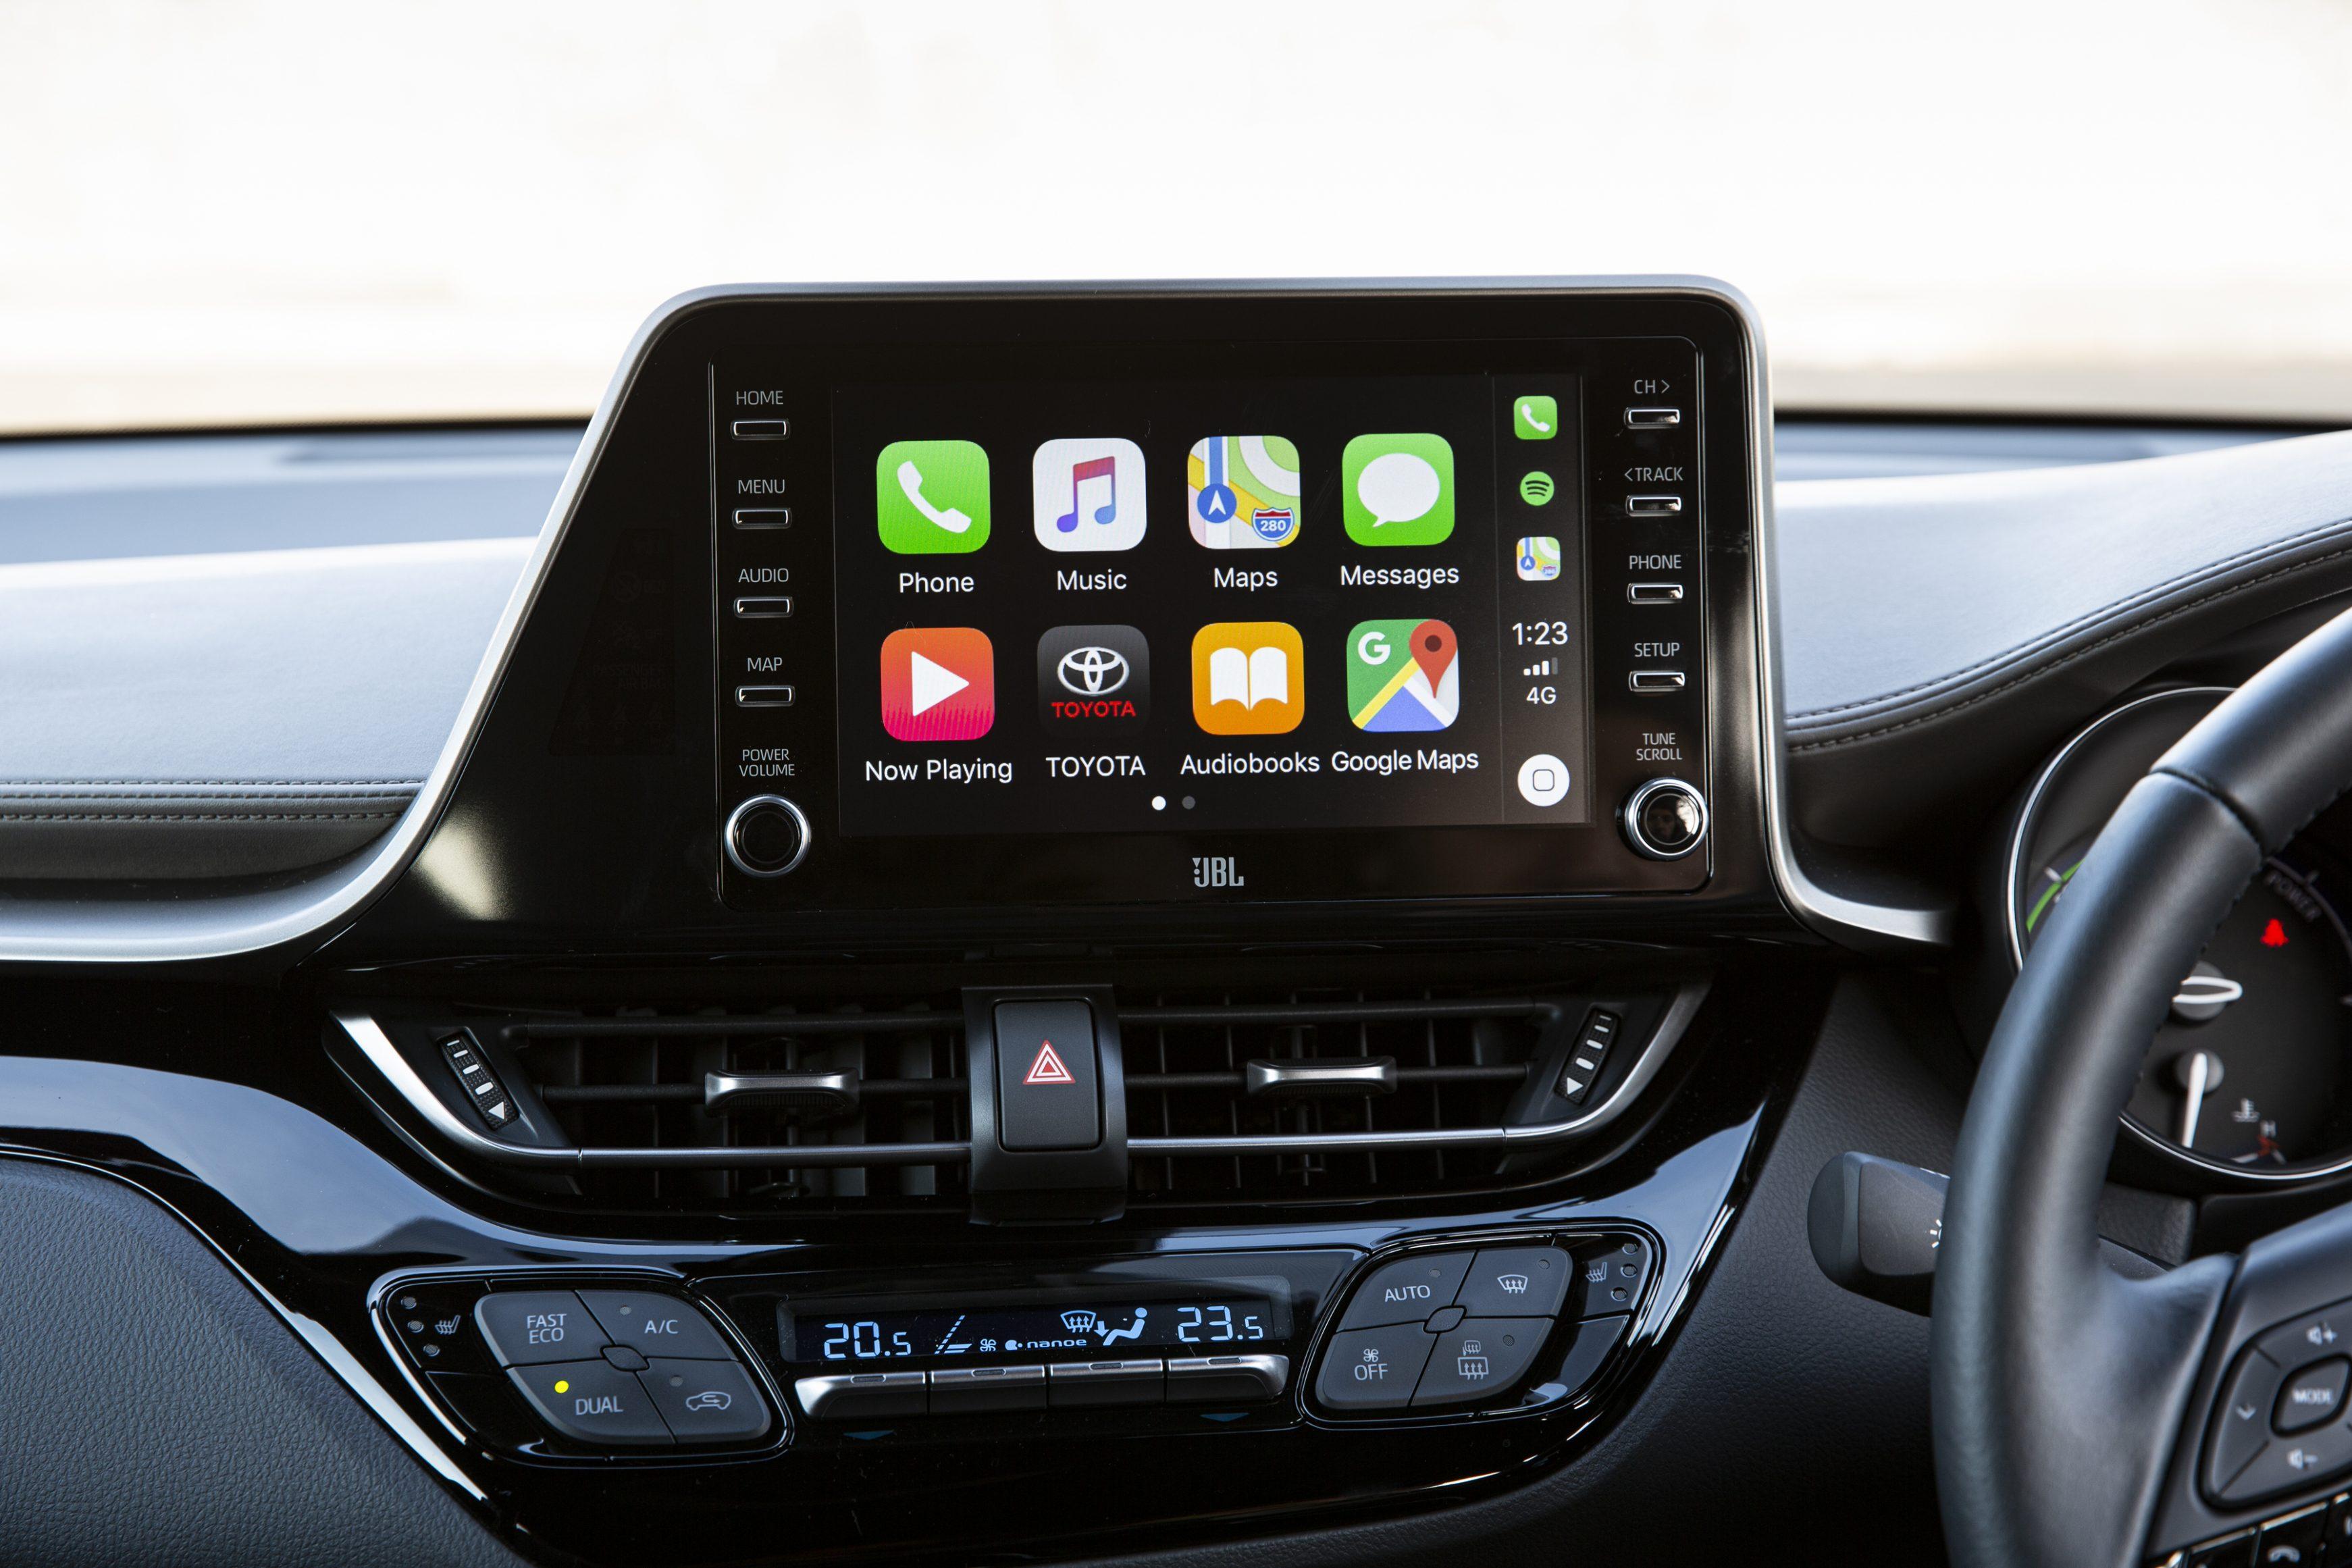 Toyota-C-HR infotainment system